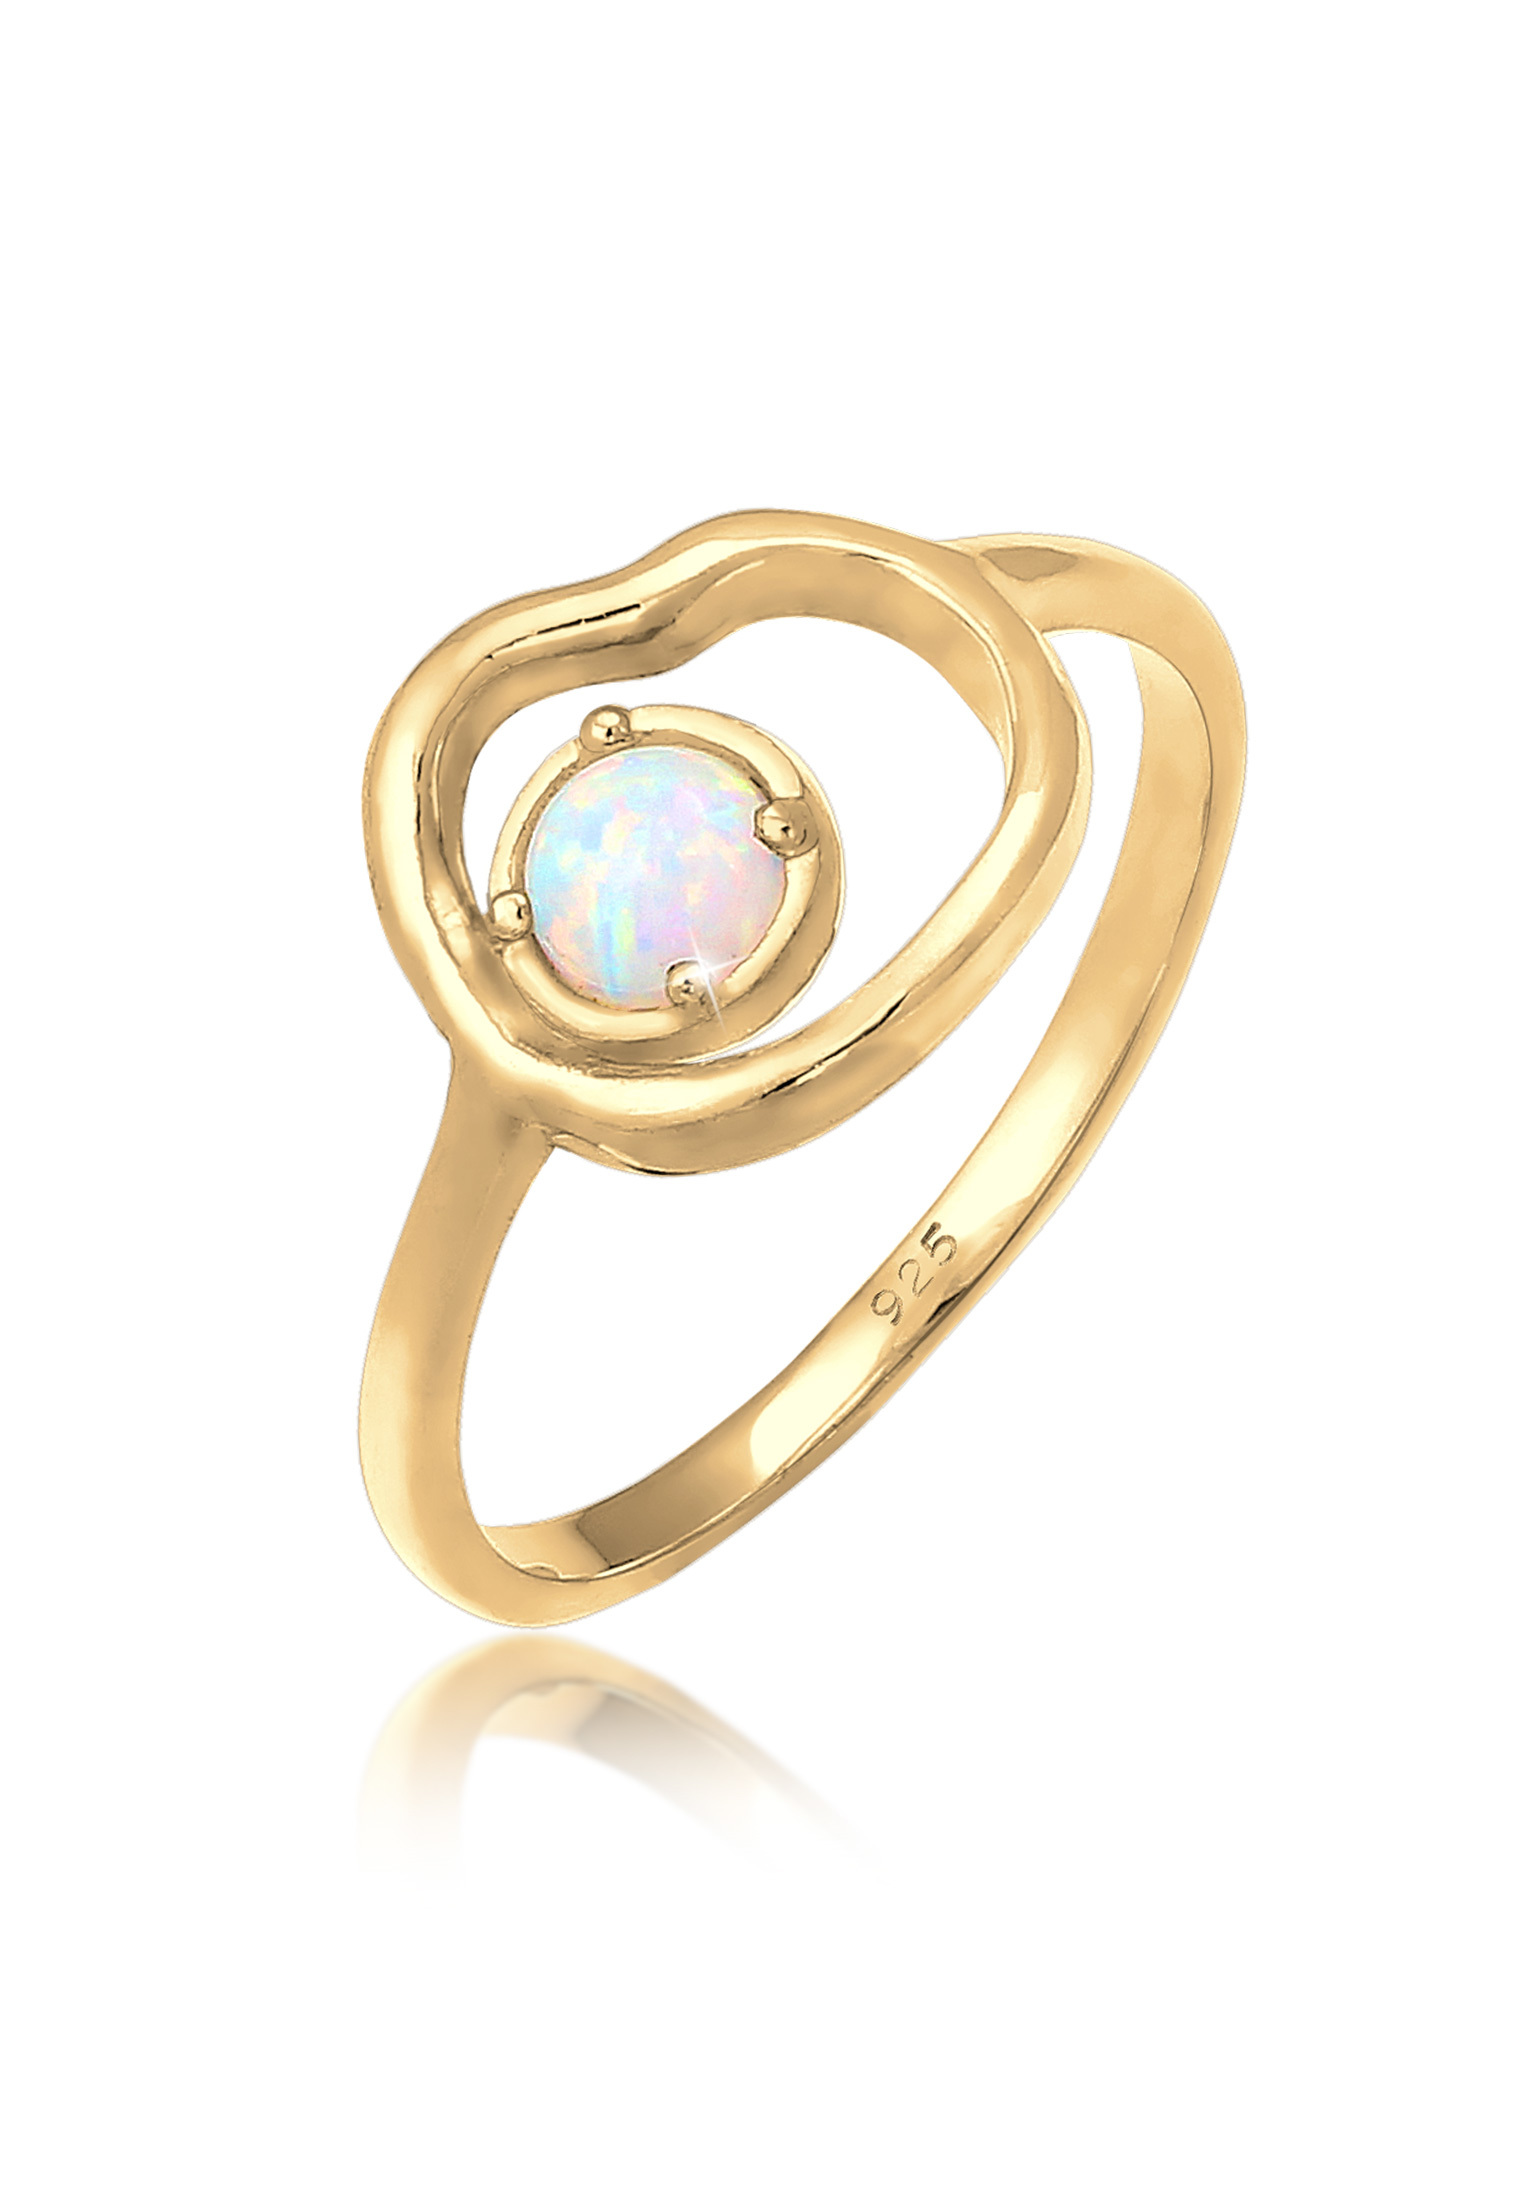 Ring | Opal ( Weiß ) | 925 Sterling Silber vergoldet